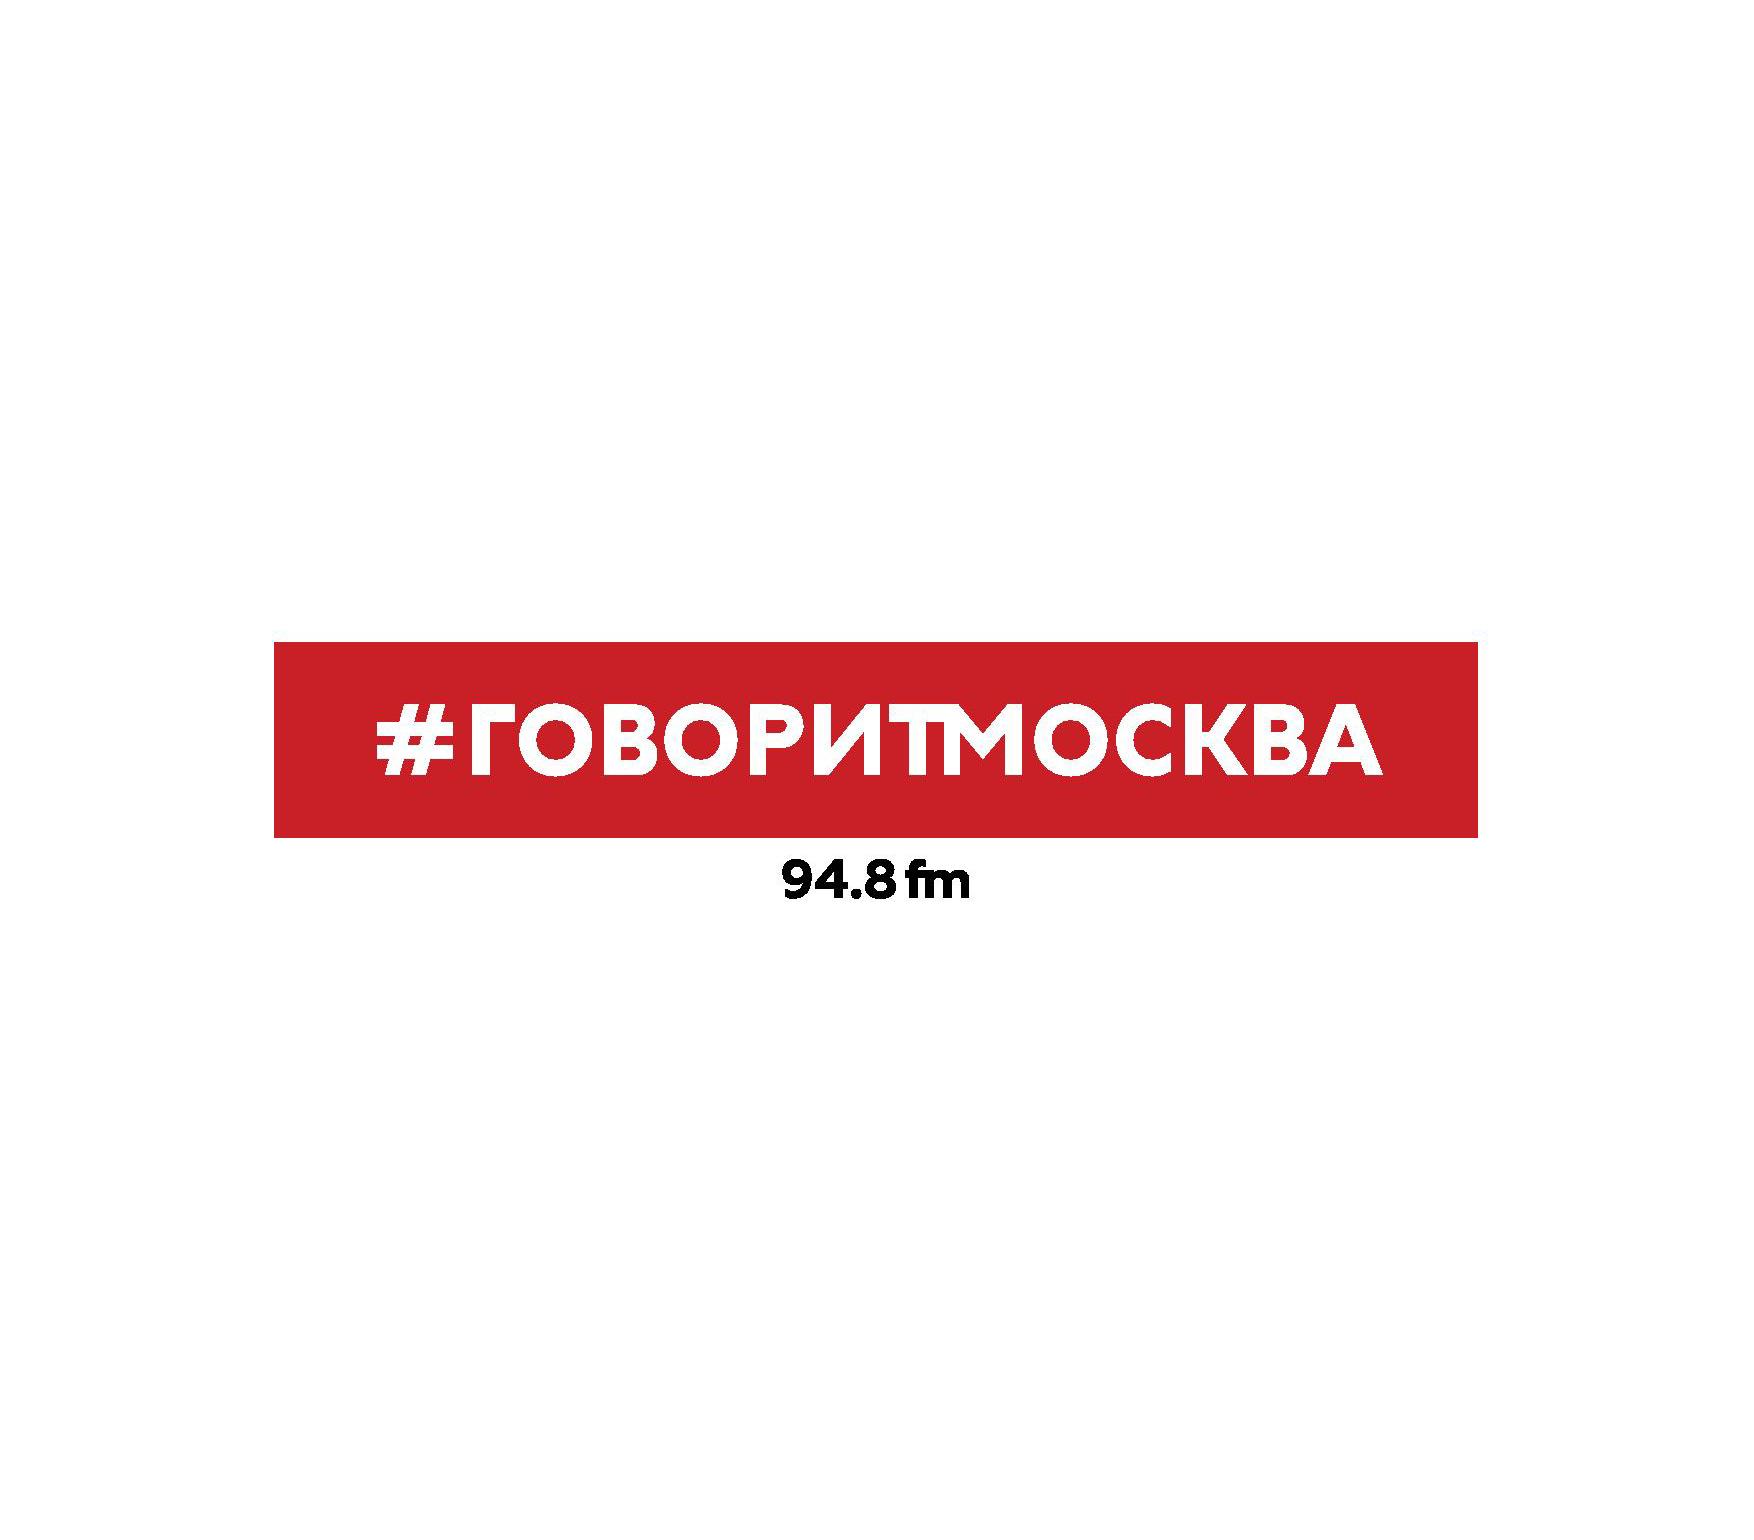 Макс Челноков 1 мая. Захар Прилепин захар прилепин летучие бурлаки сборник